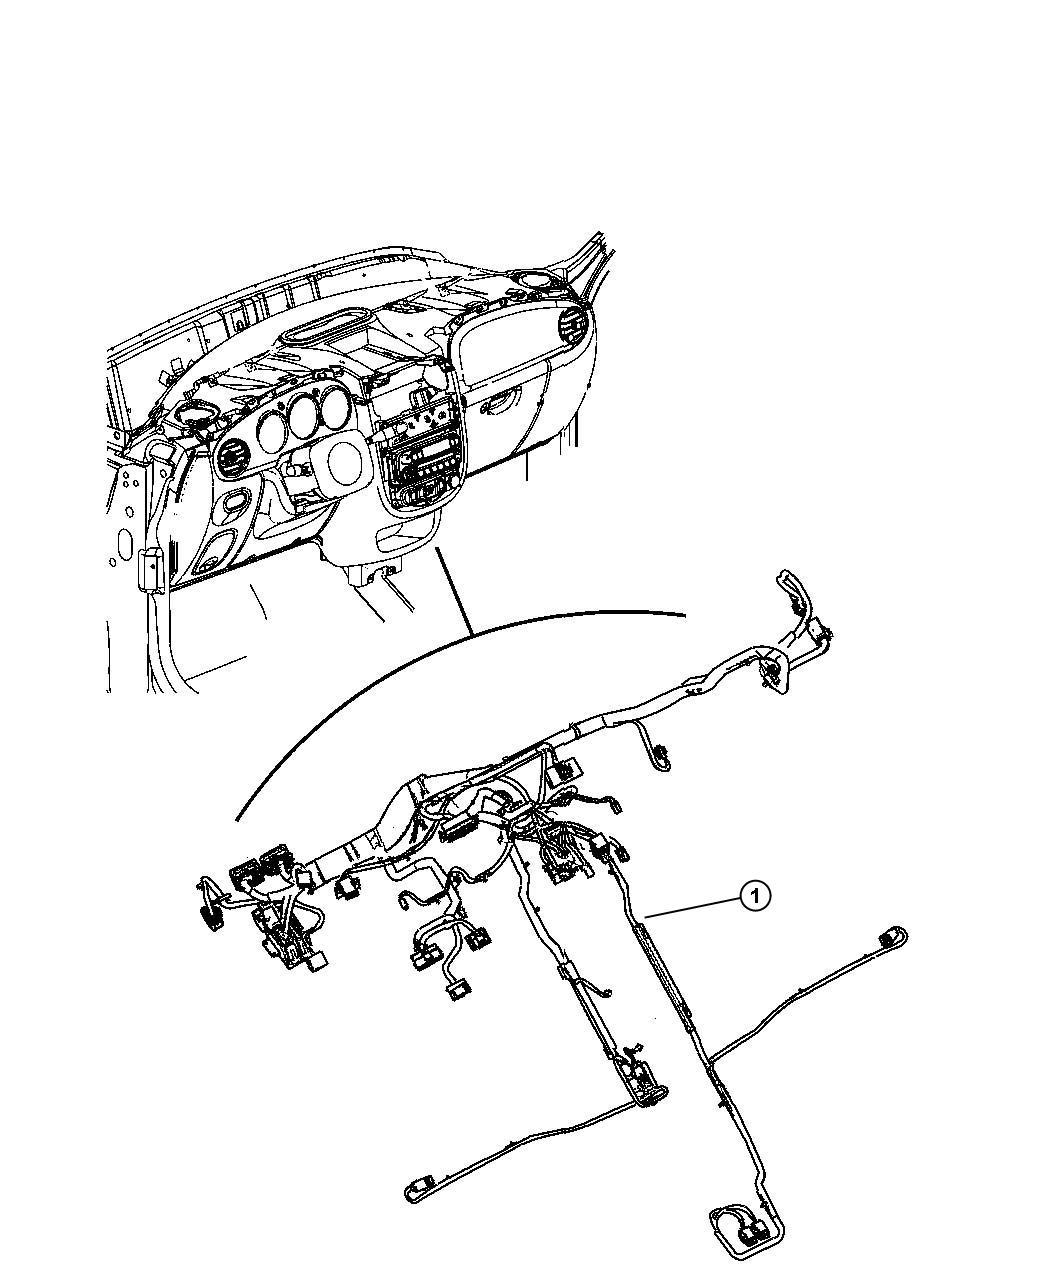 Chrysler Pt Cruiser Wiring Instrument Panel Spkrs Mast